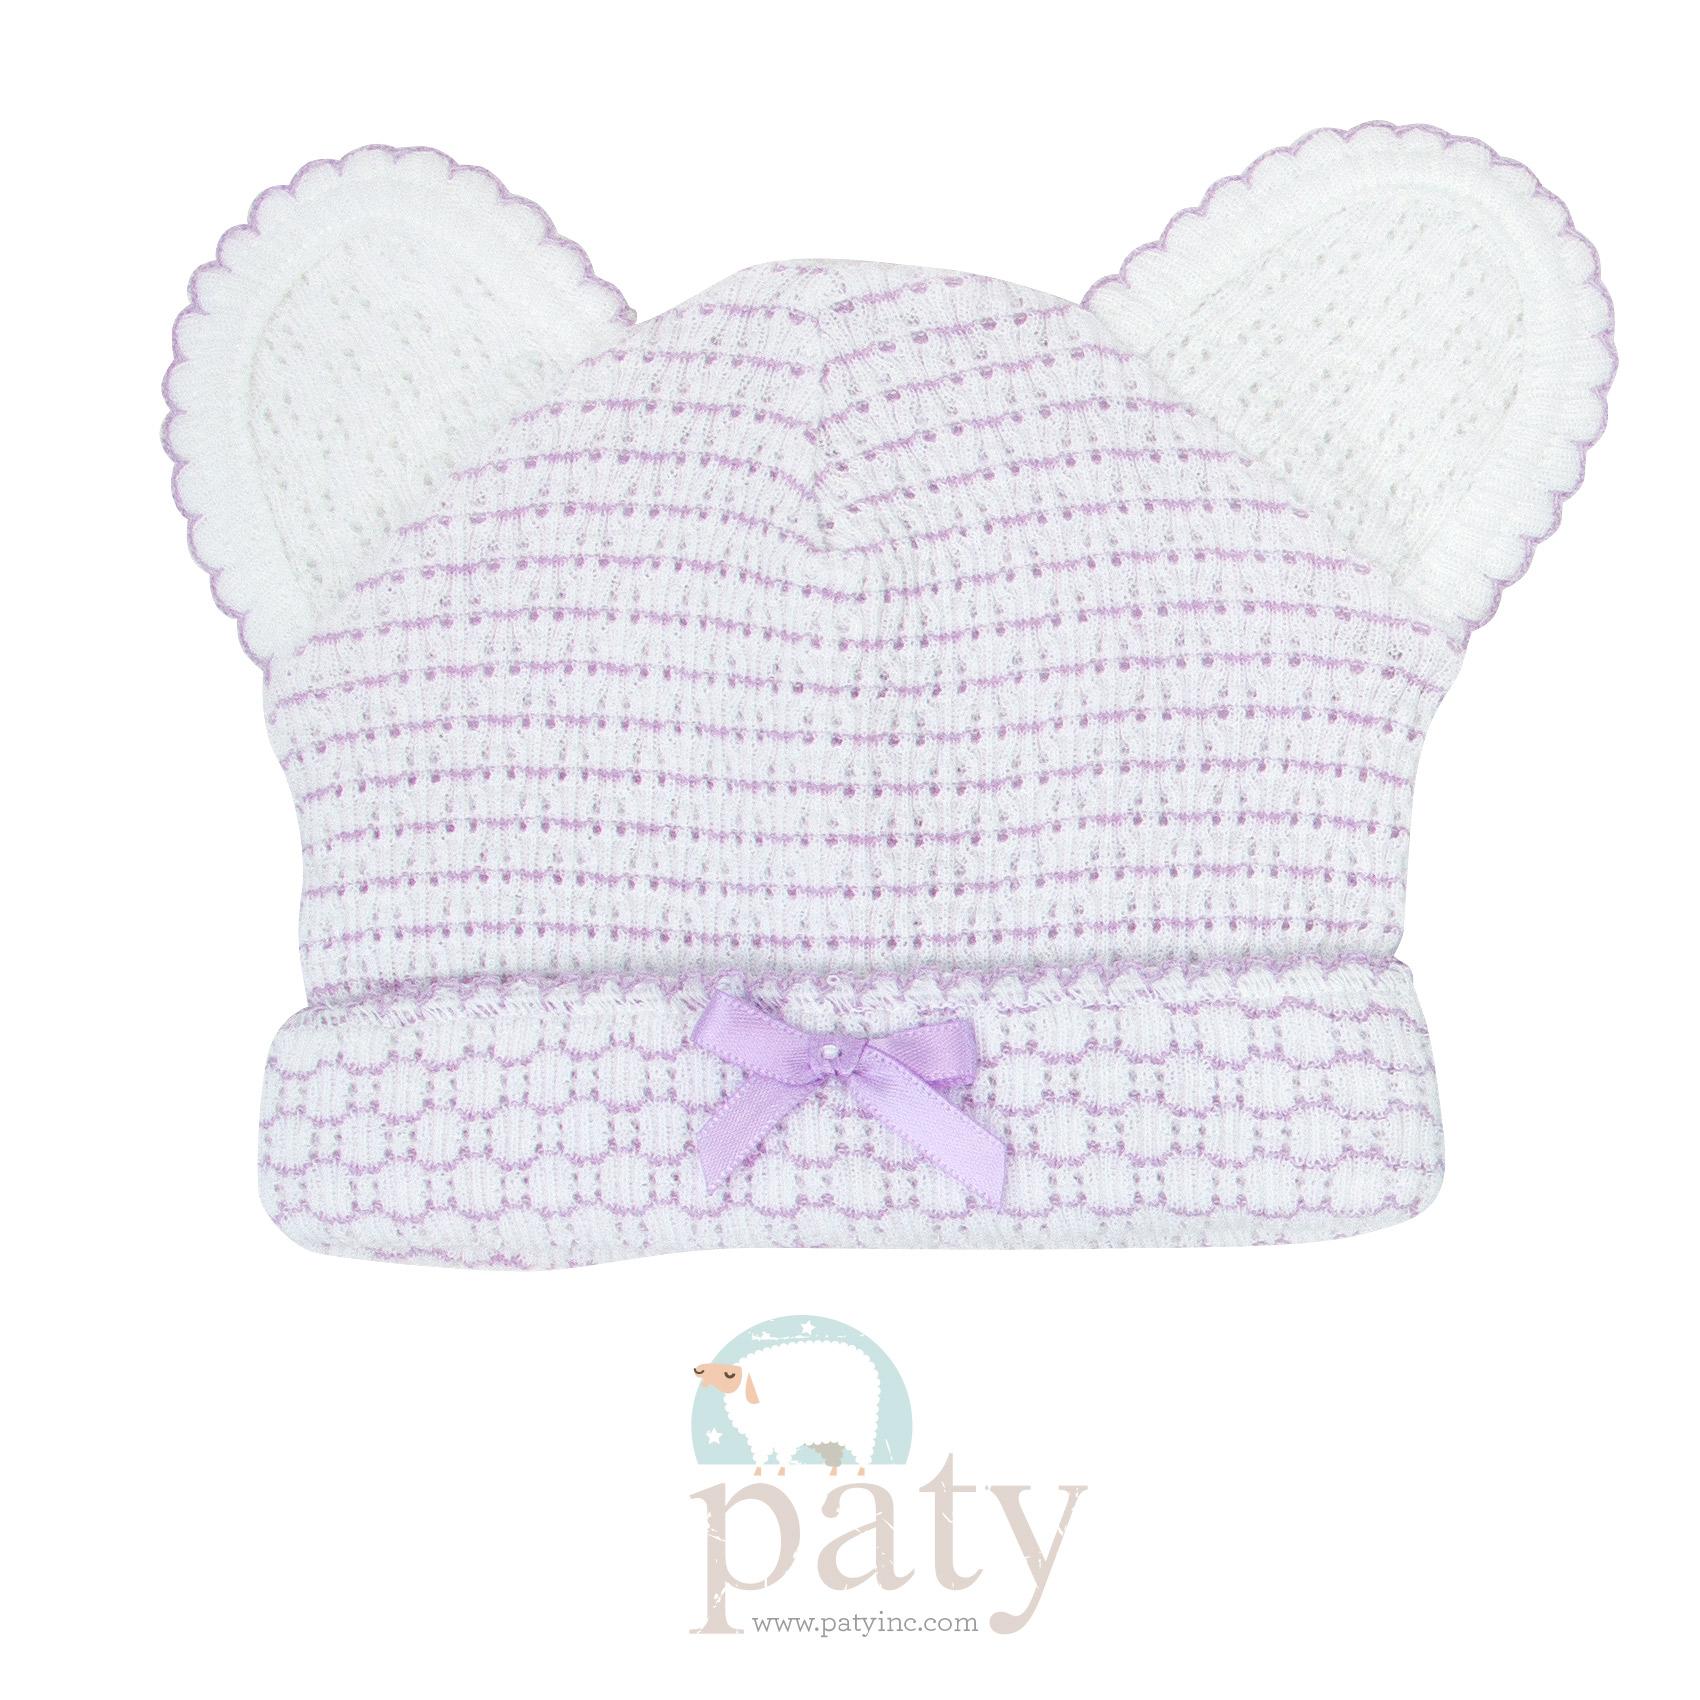 Classic Paty Knit Lavender Pinstripe Bear Caps